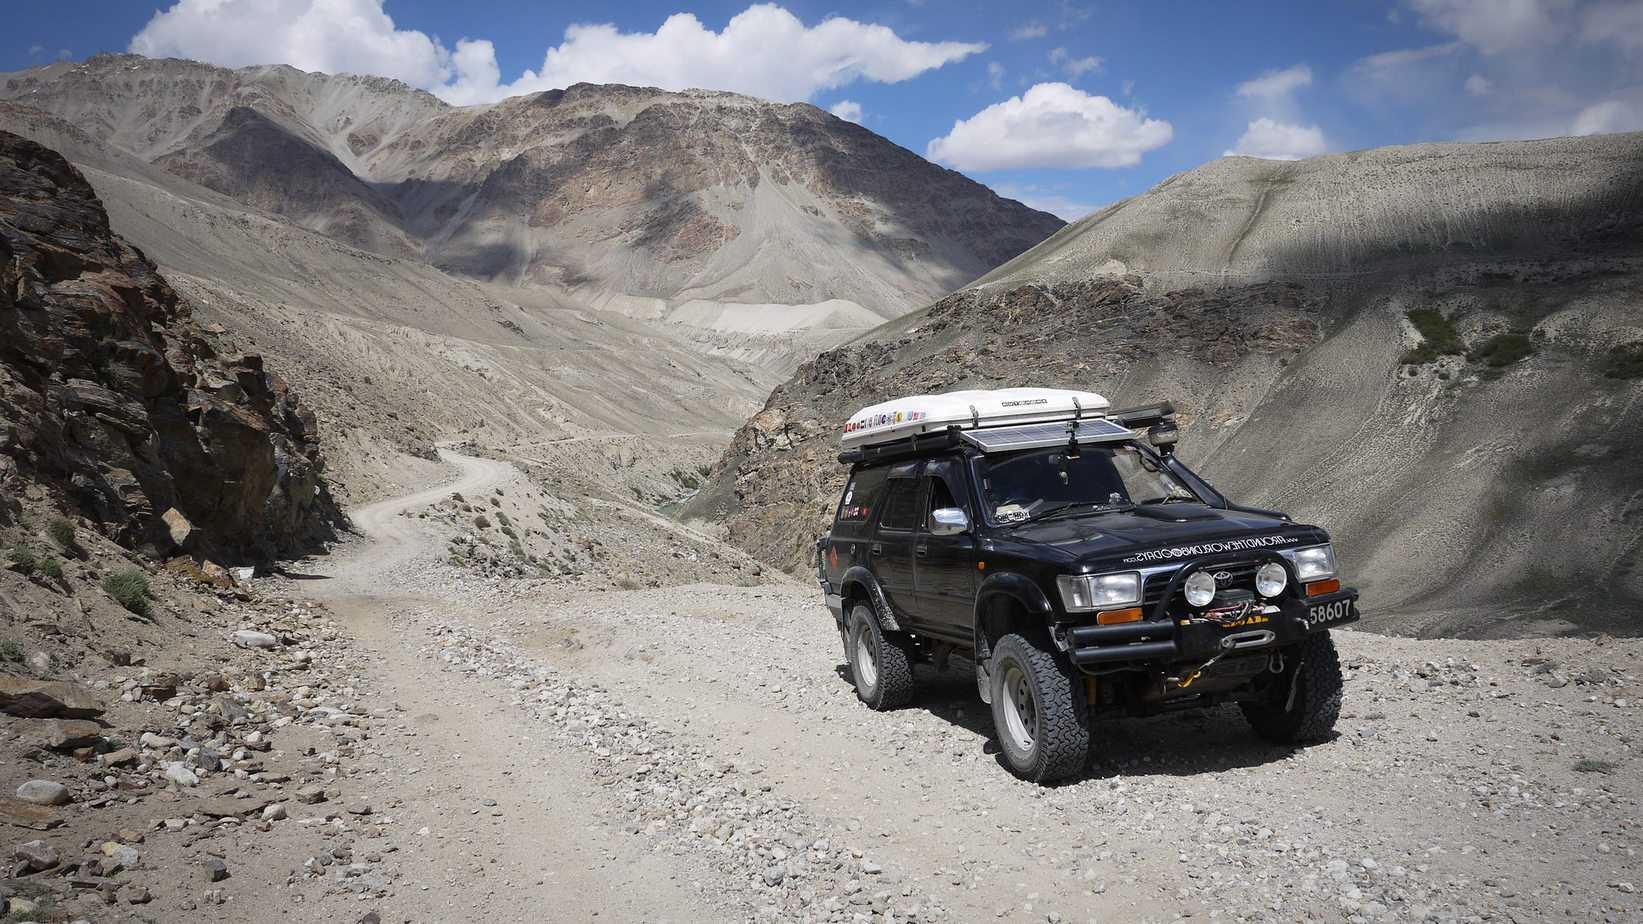 The Wakhan Corridor Road